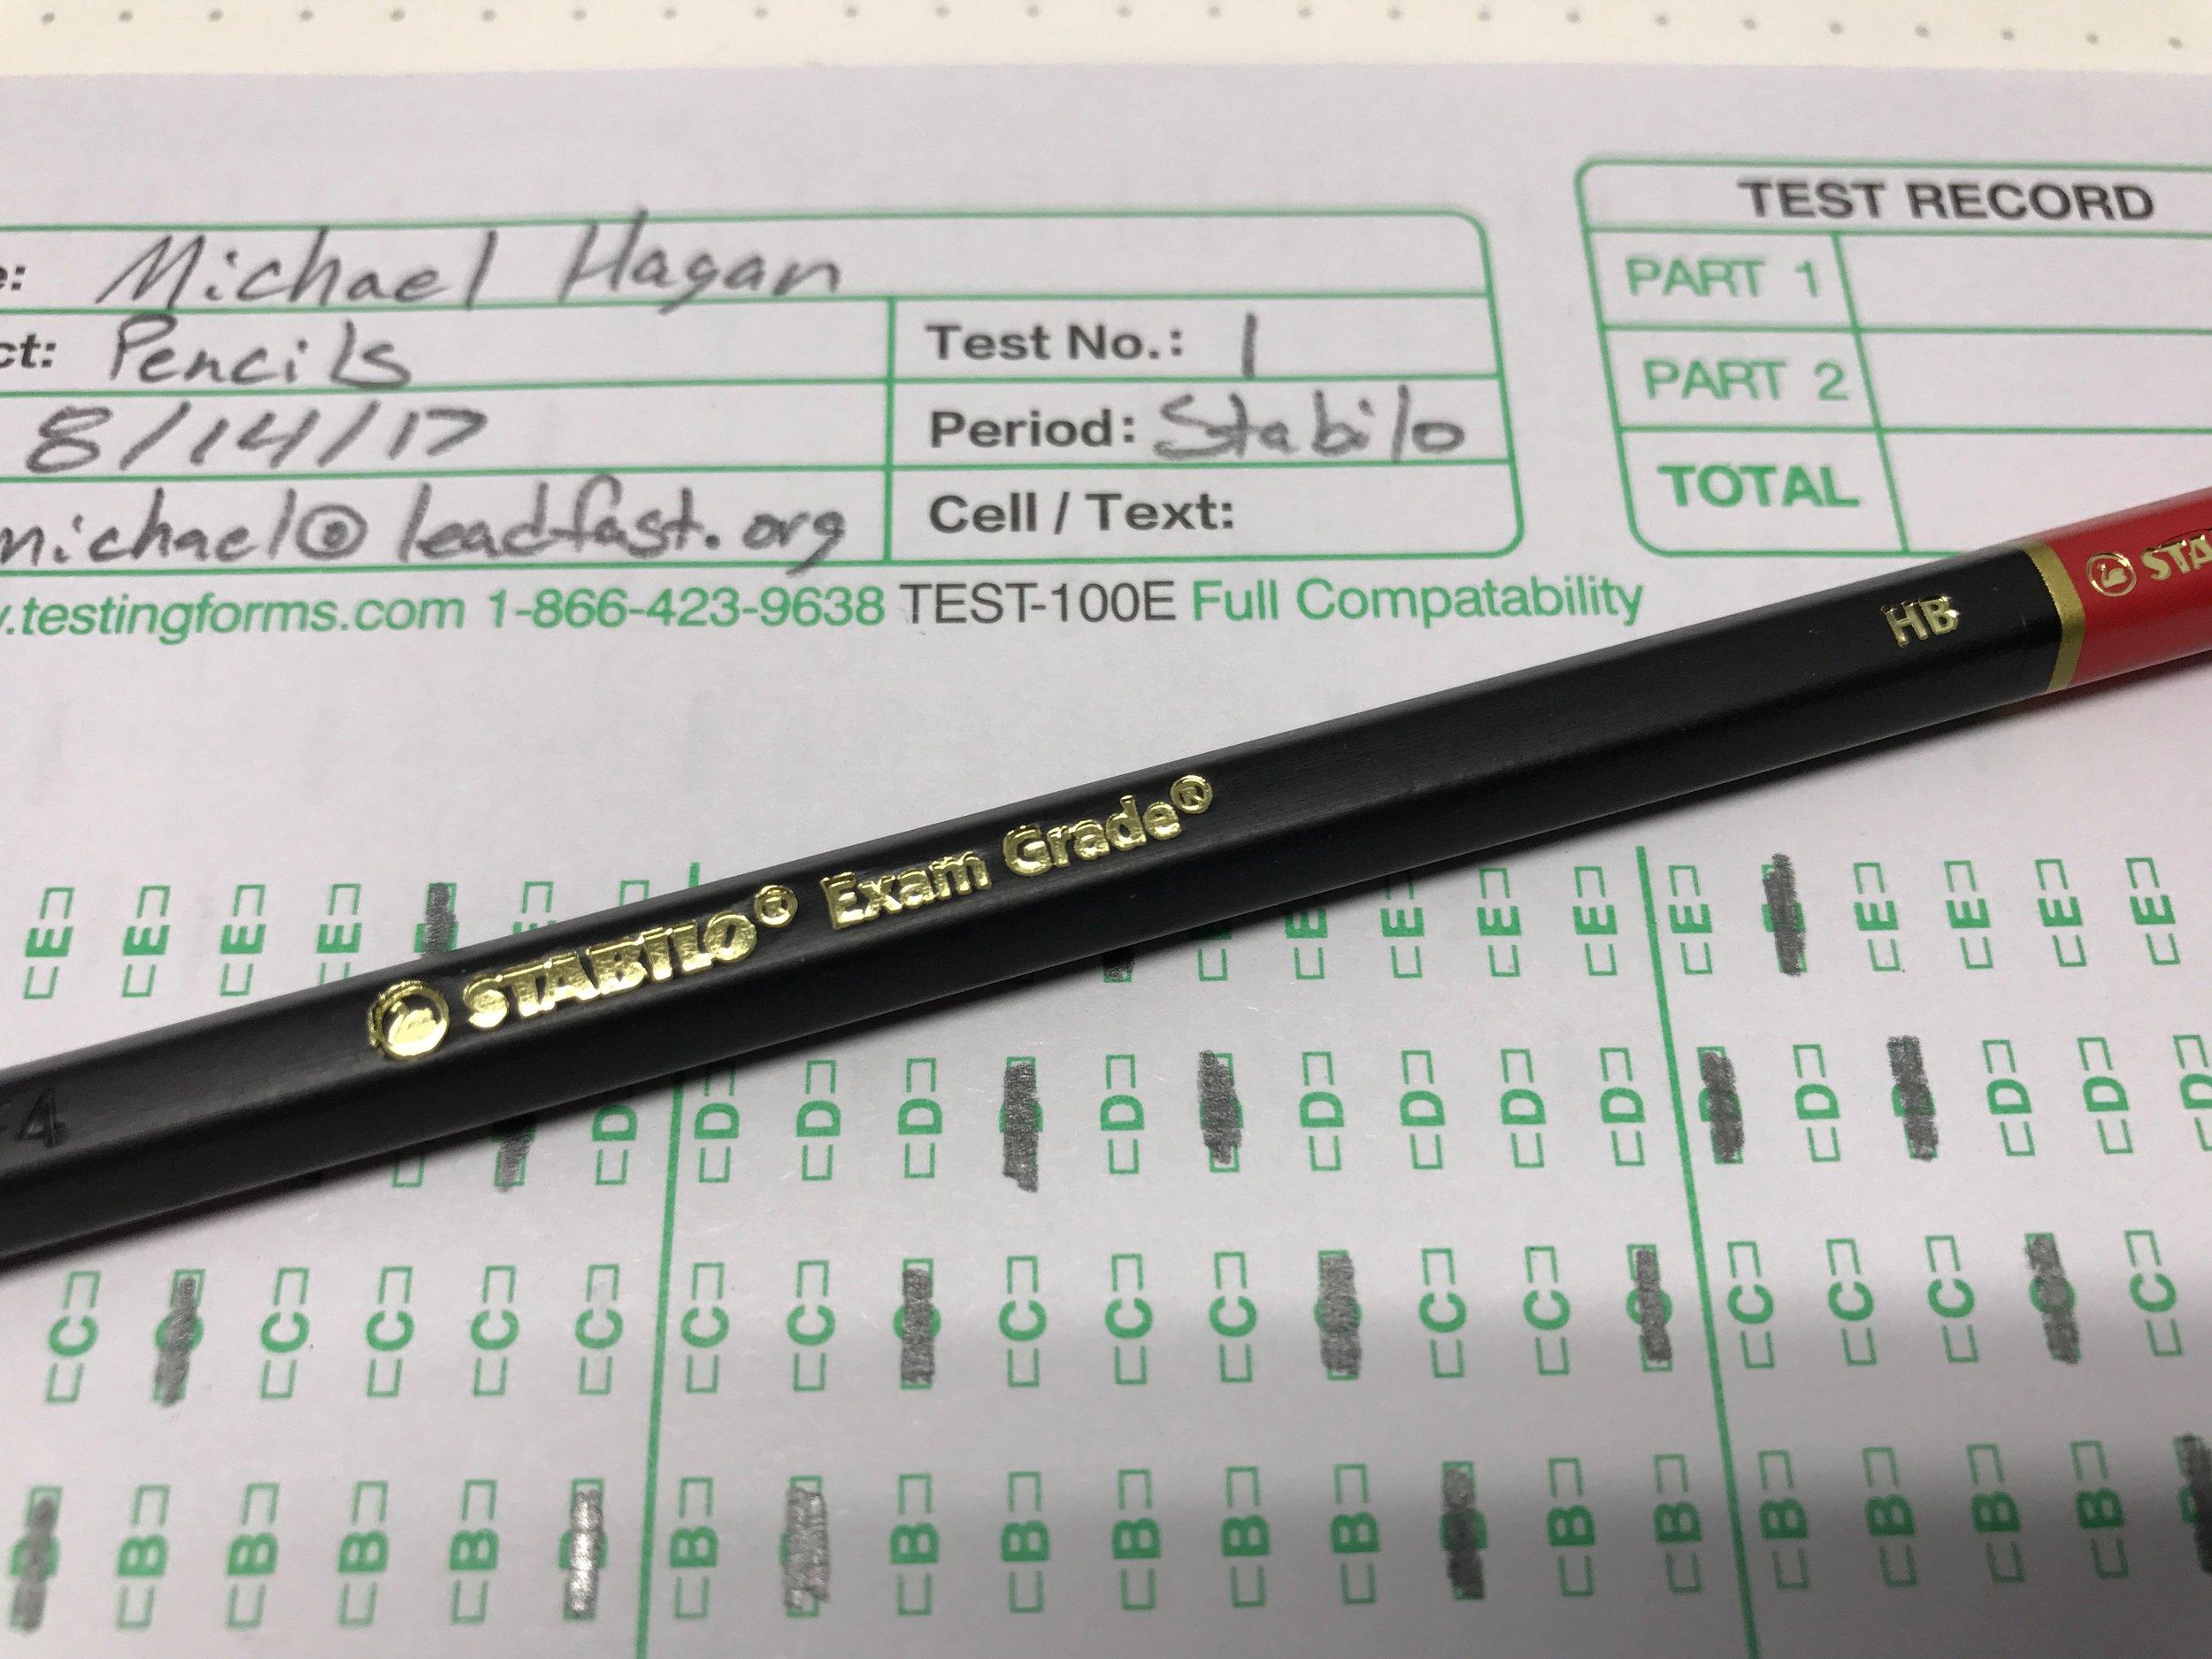 Stabilo-Exam-Grade-Pencil-1.jpg